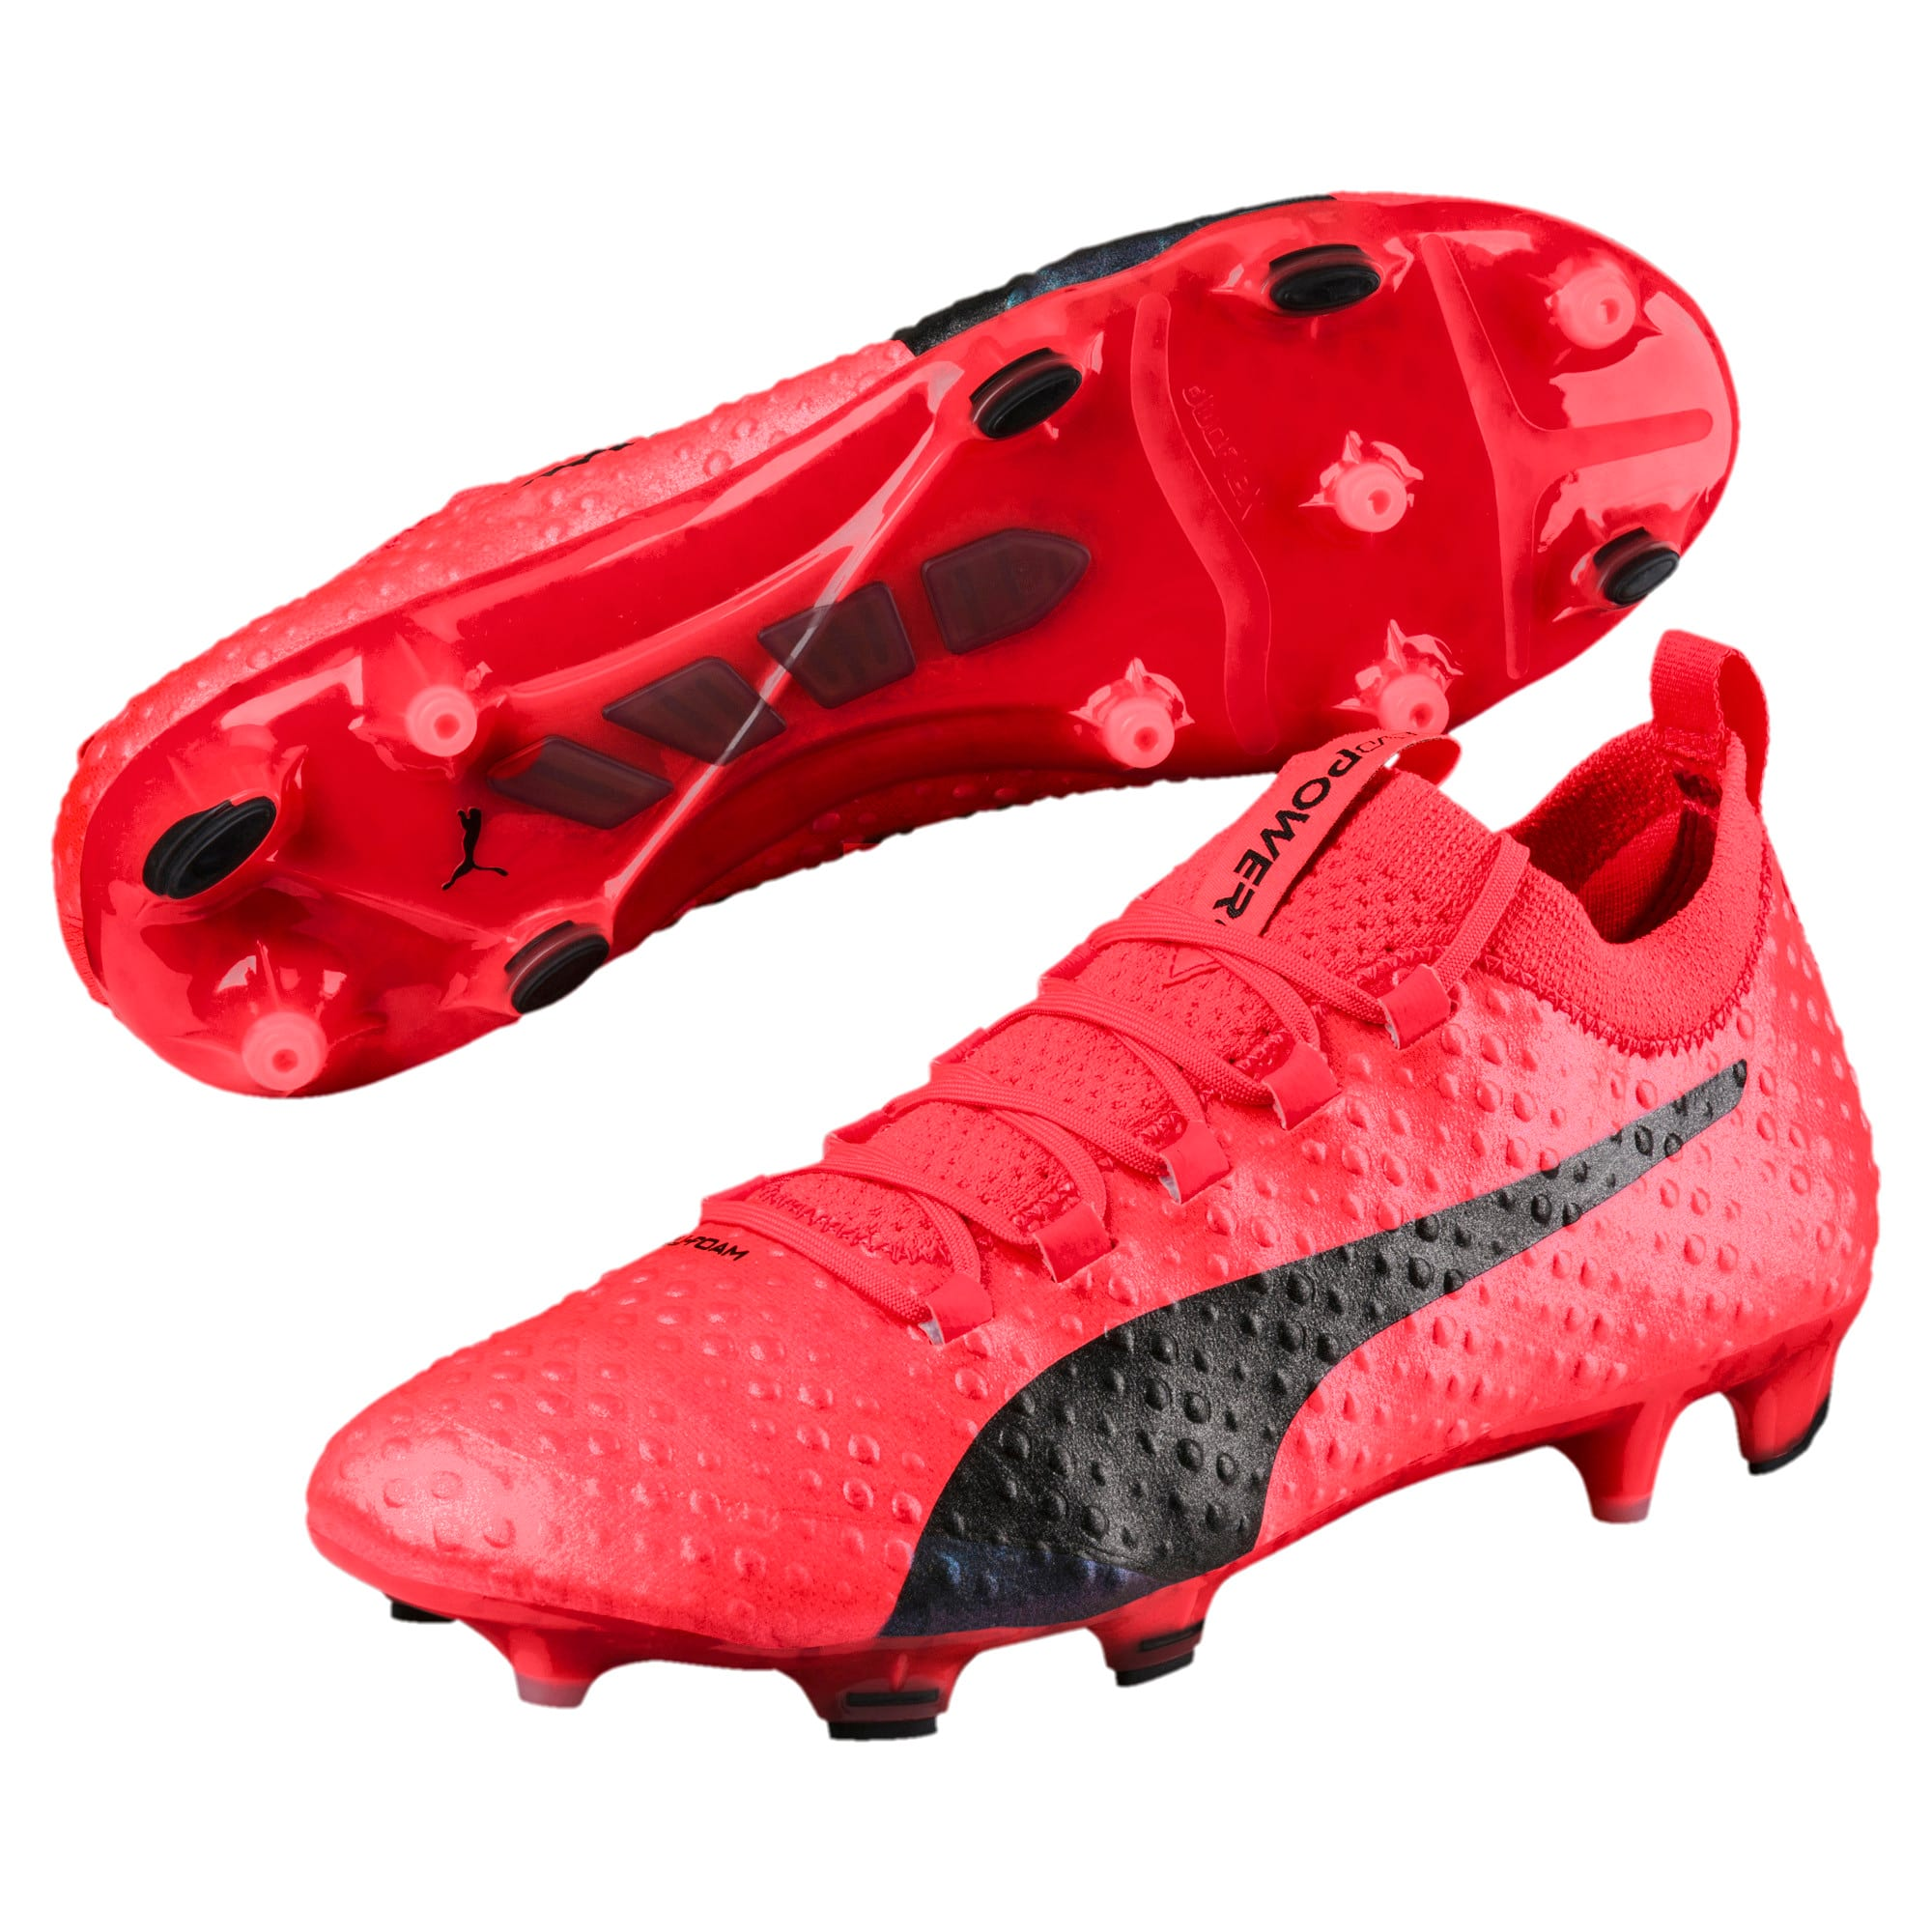 Thumbnail 2 of evoPOWER Vigor 3D 1 FG Men's Firm Ground Soccer Cleats, Coral-Black-Toreador, medium